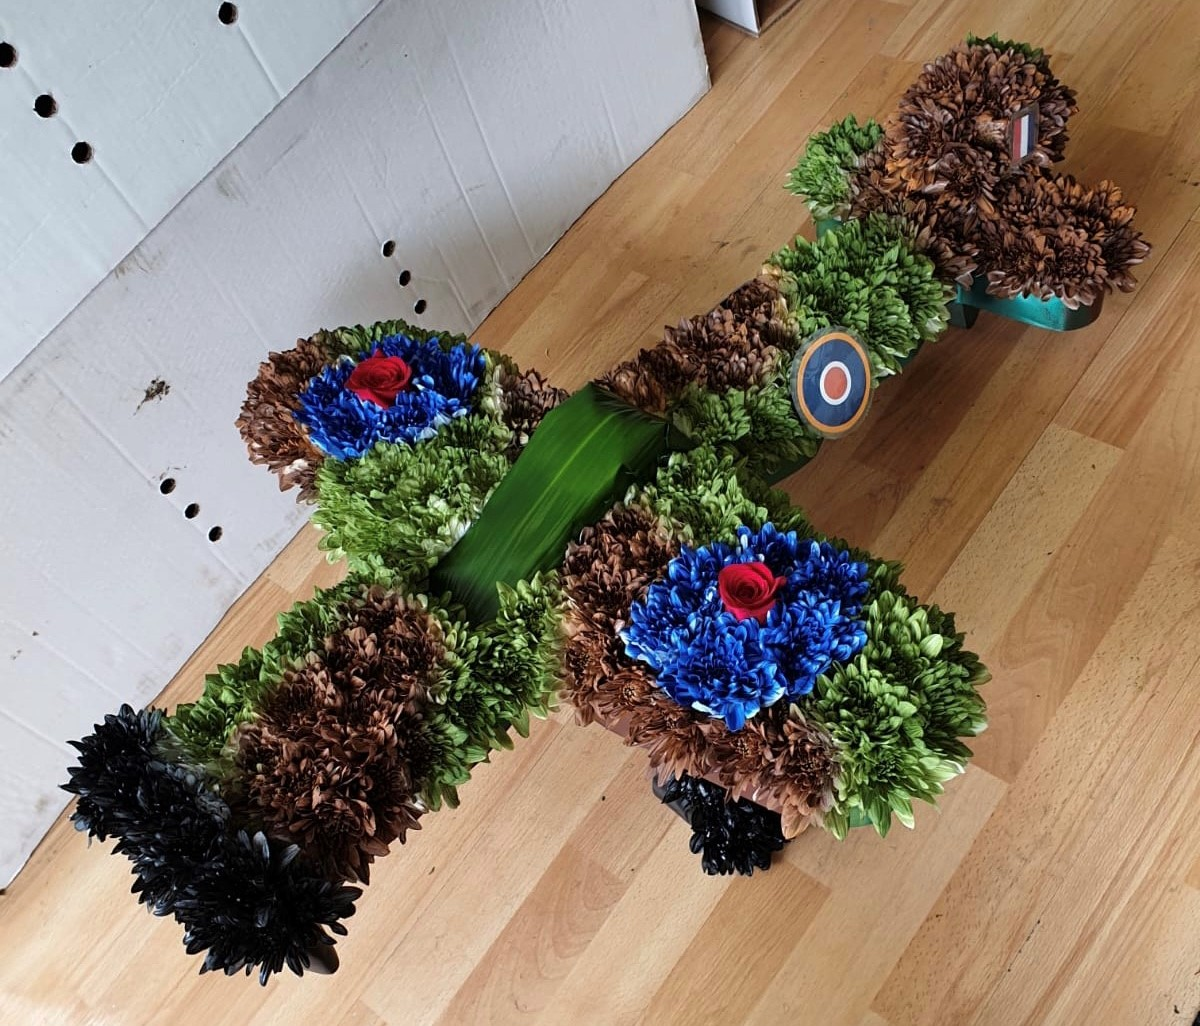 Spitfire £225.00